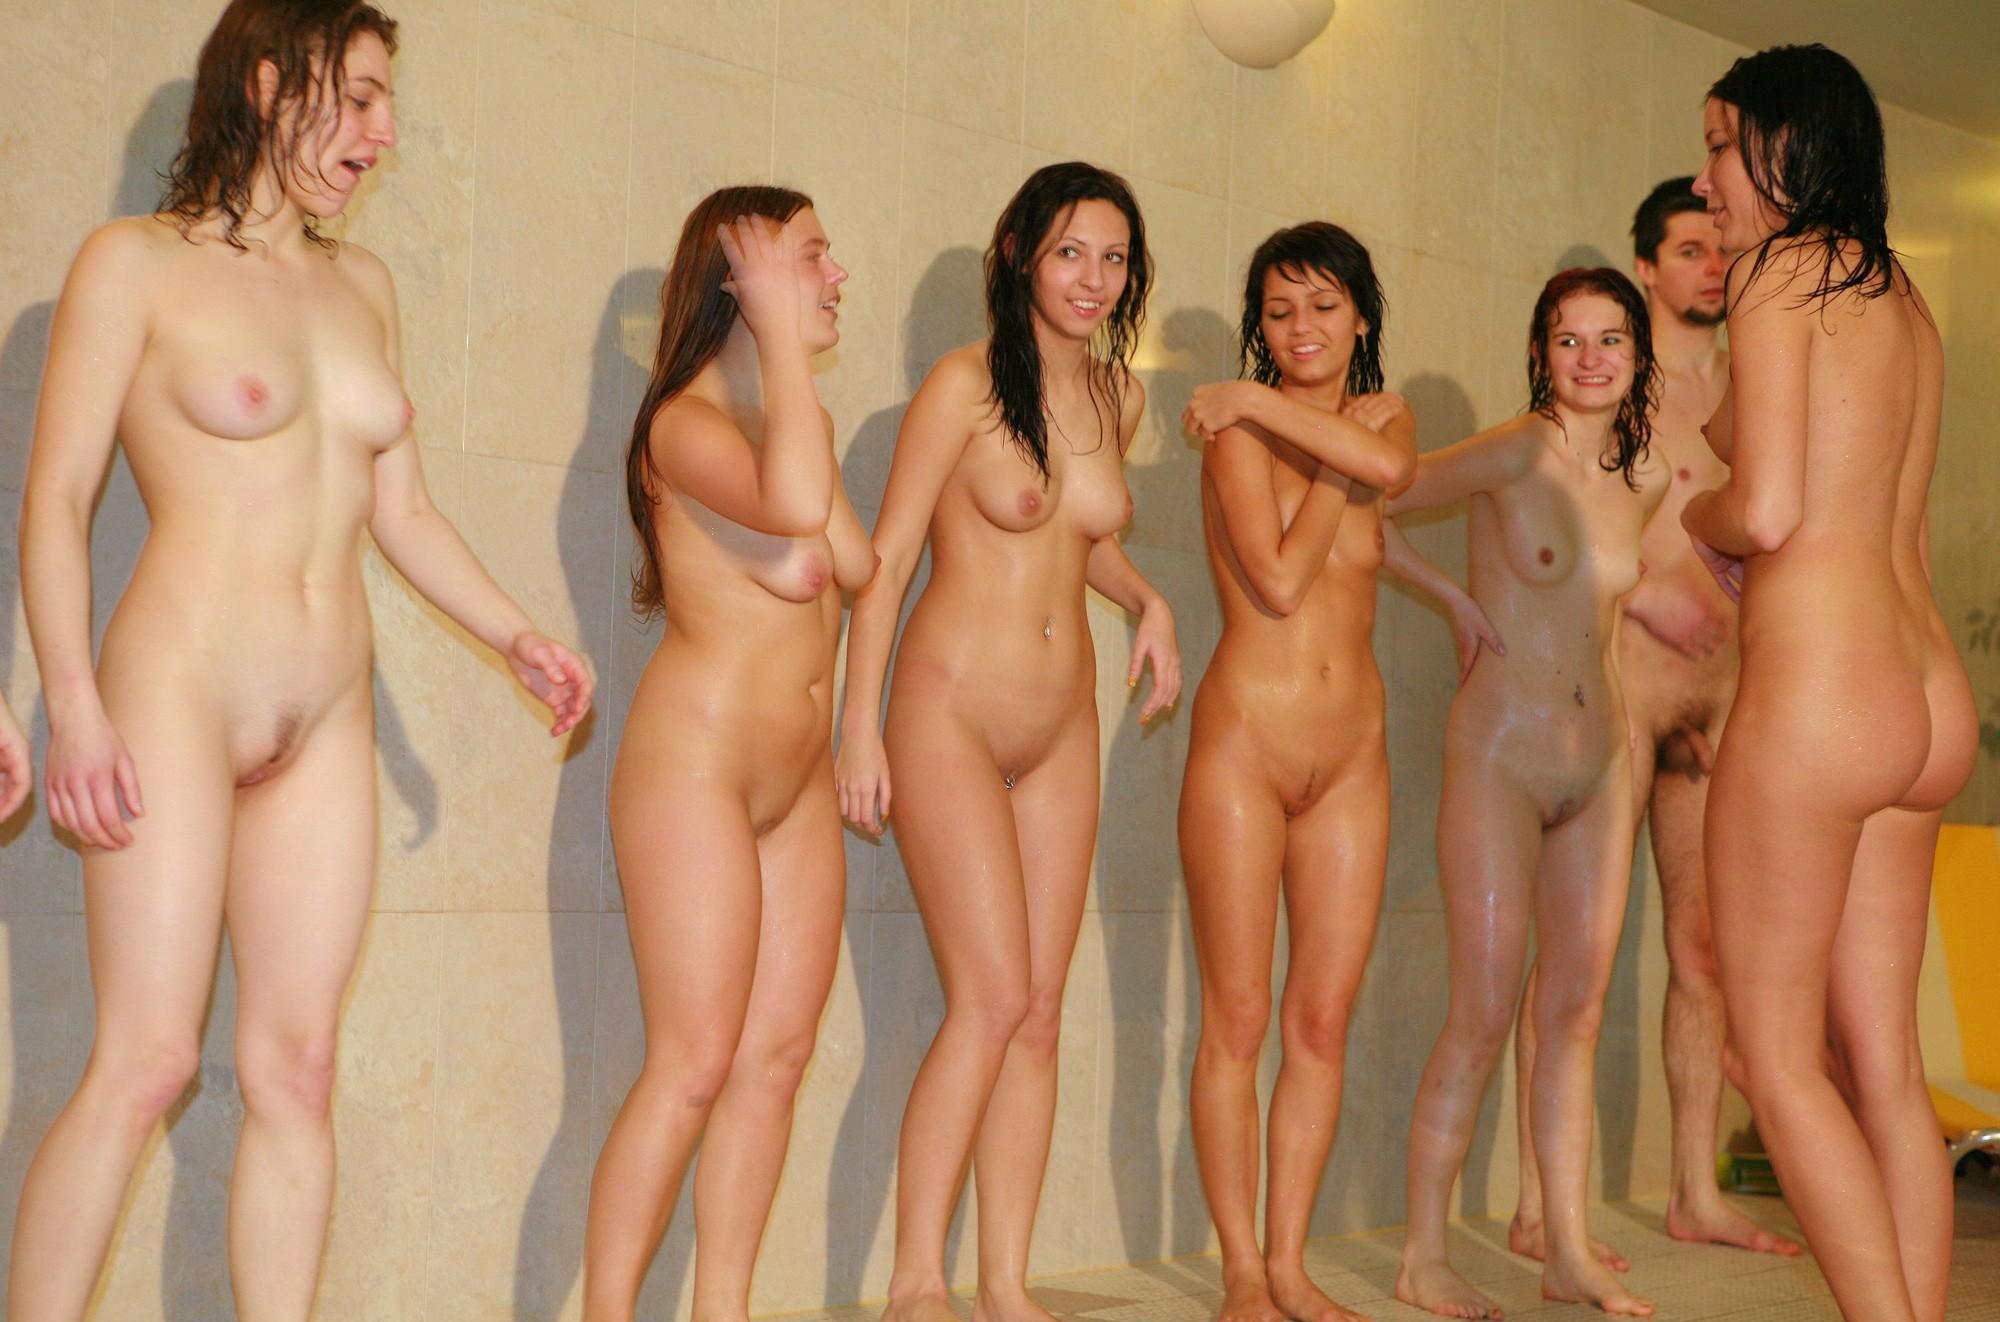 Naked women group nude girls sauna